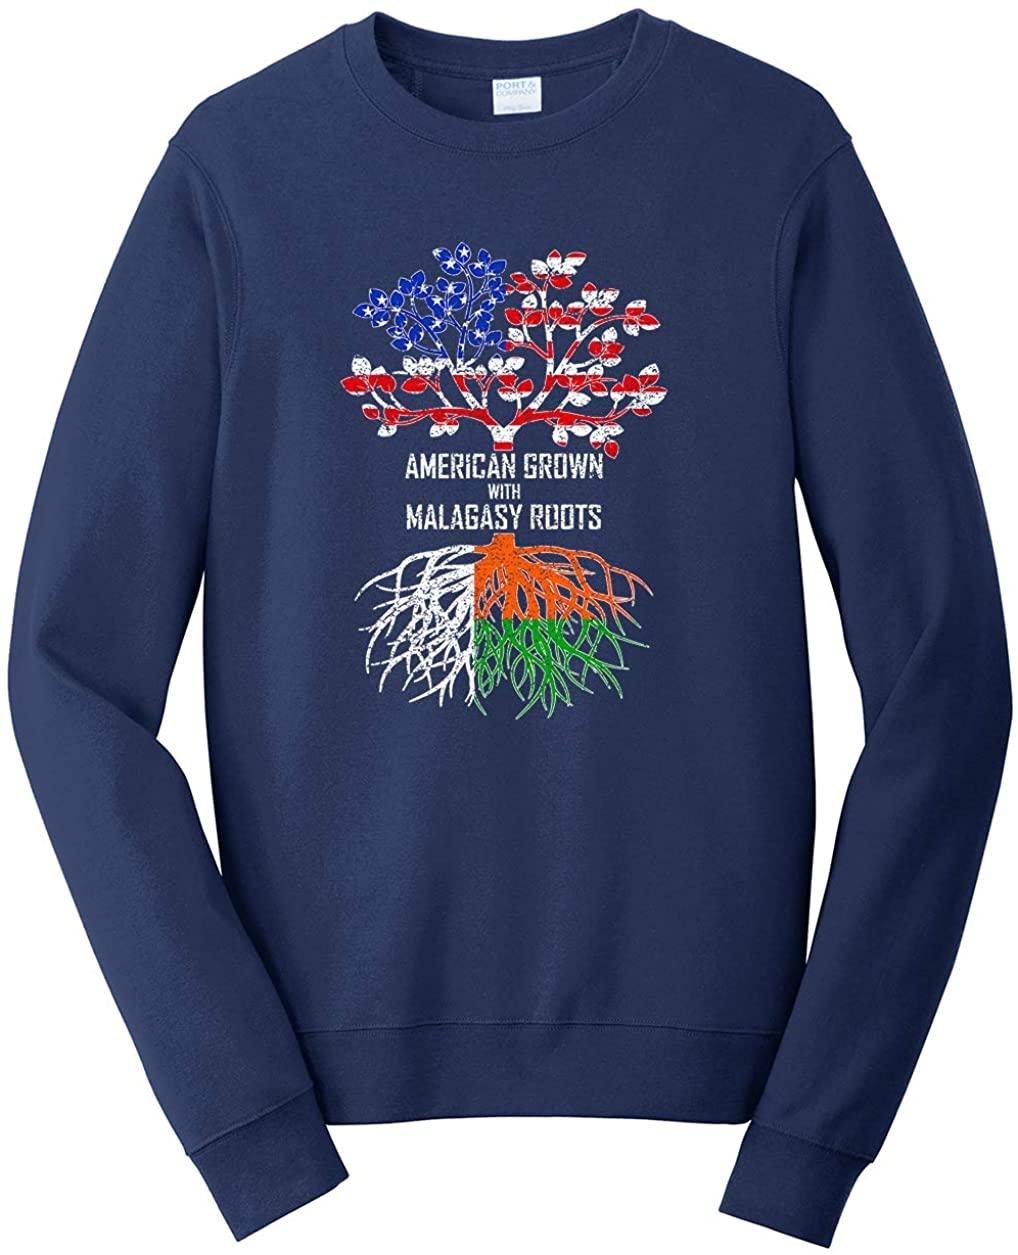 Tenacitee Unisex American Grown with Malagasy Roots Sweatshirt